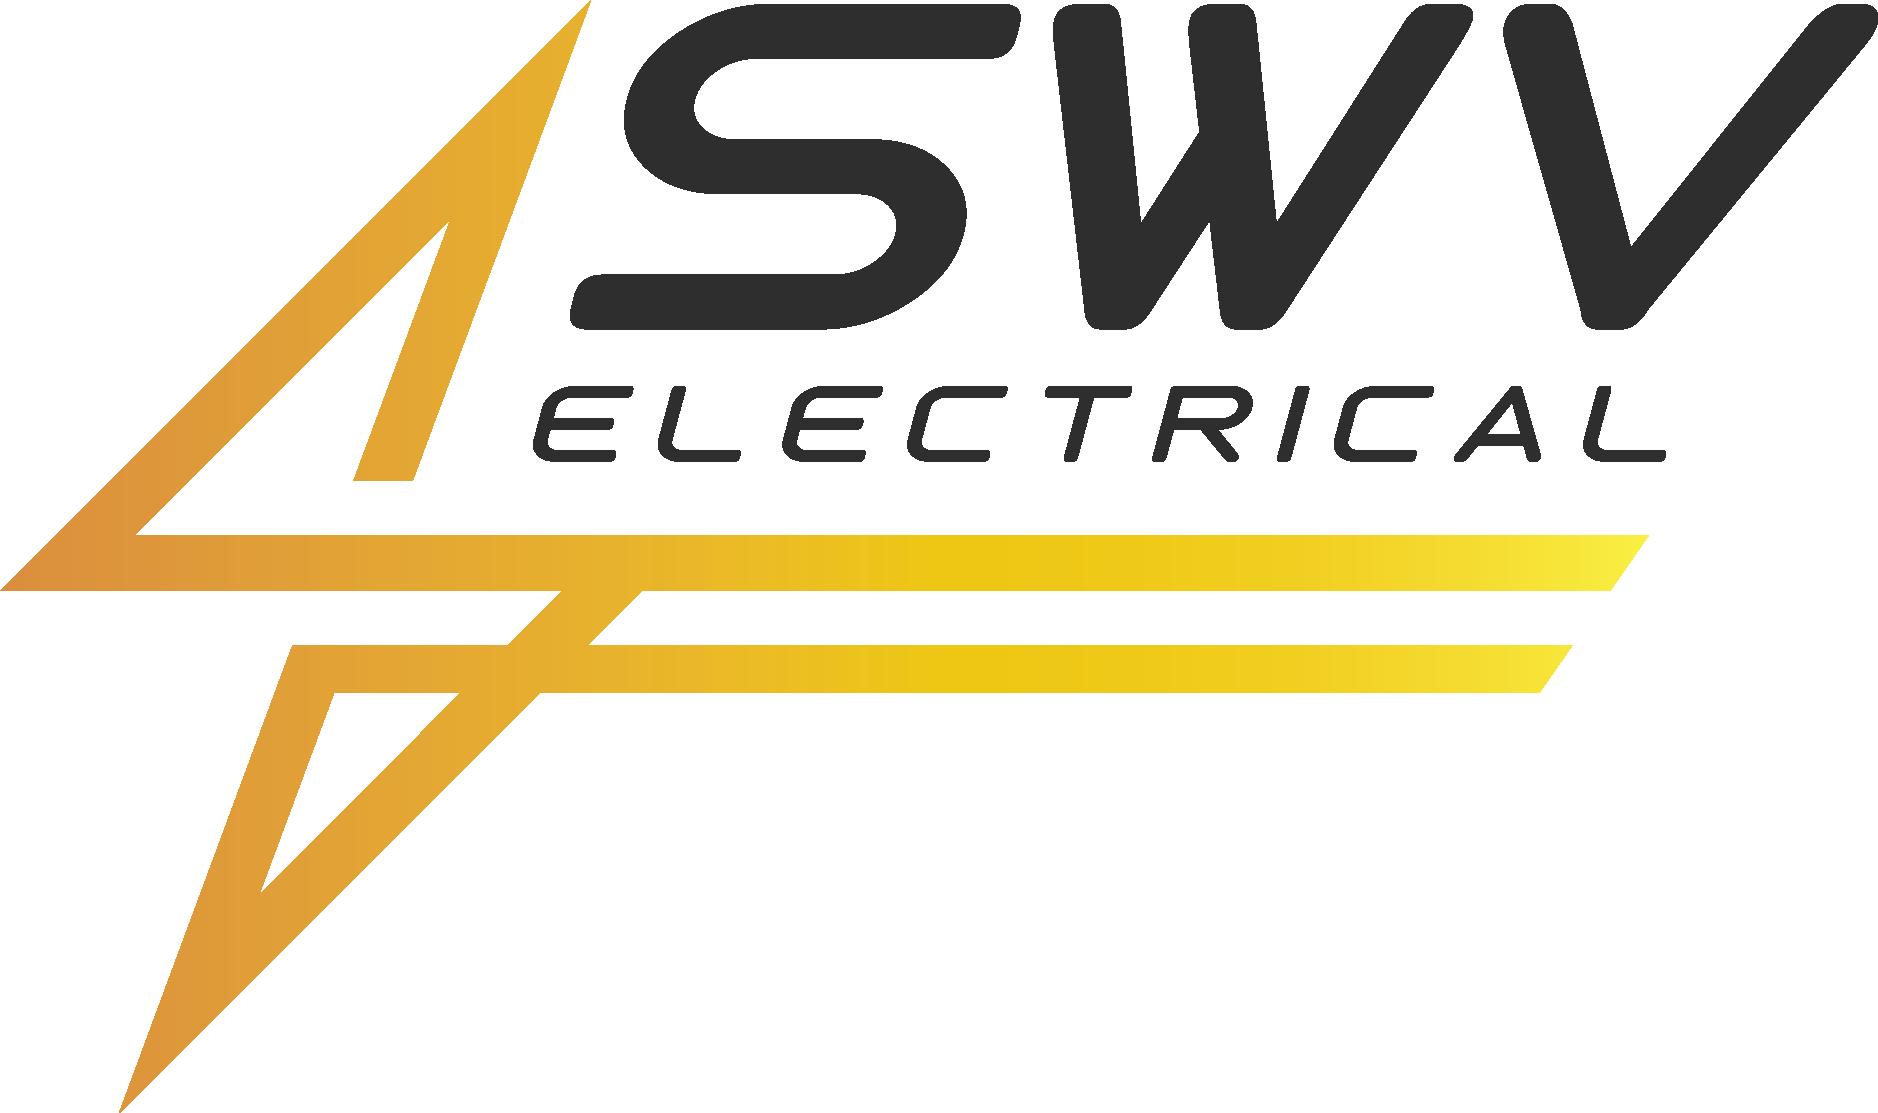 Stephen W Voigt Electrical (Pty) Ltd